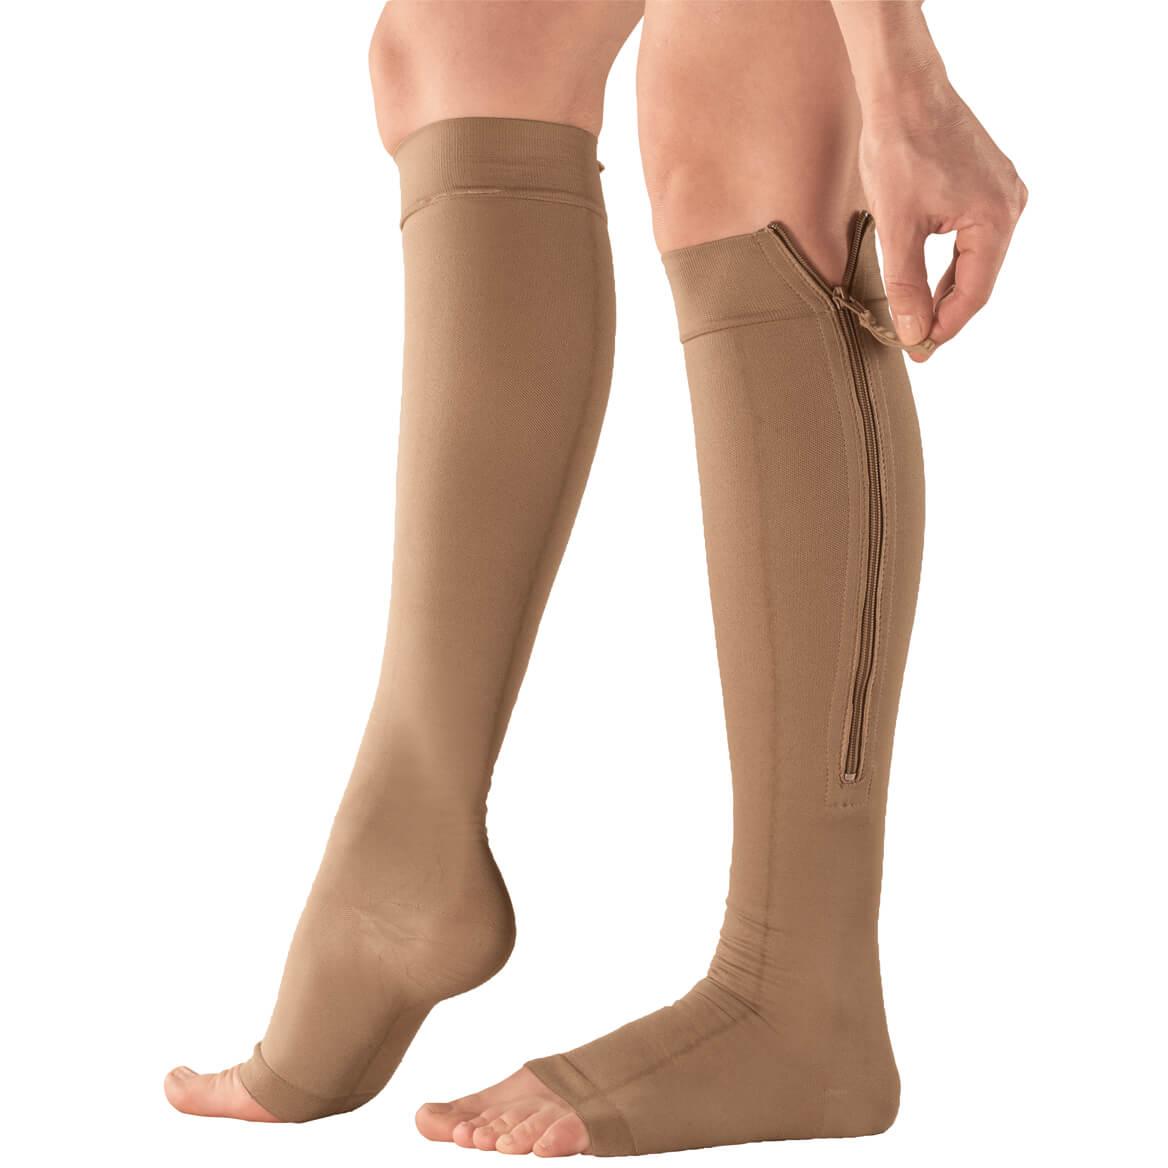 Silver Steps™ EZ Zip Open Toe Compression Socks, 20-30 mmHg-360011